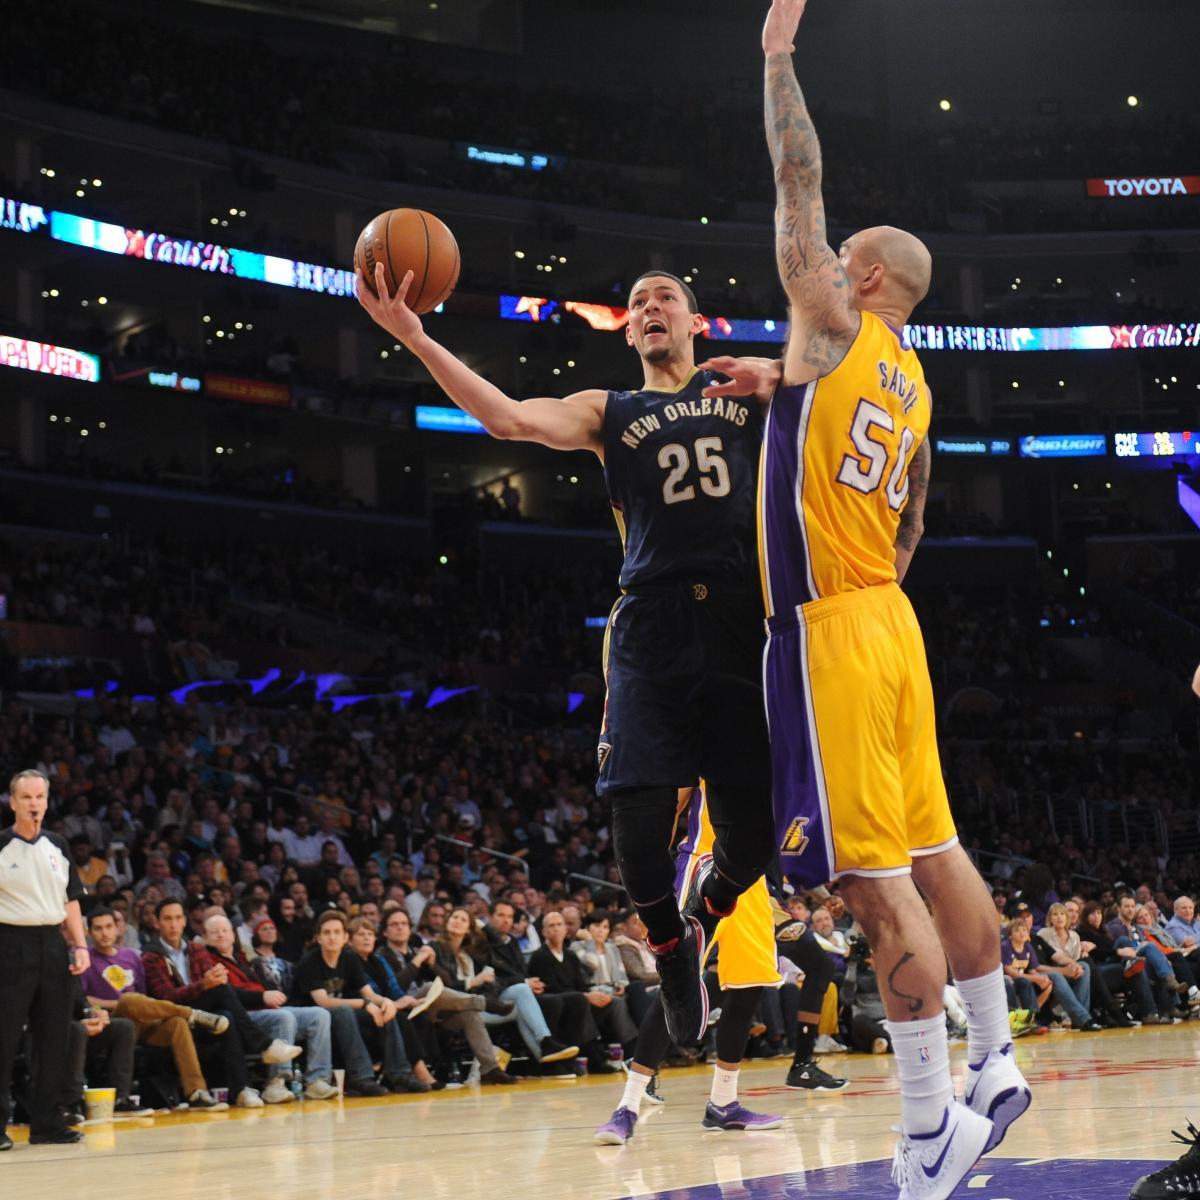 805aa161dcf Mike D'Antoni Calls Robert Sacre Los Angeles Lakers' 'Best Defensive Player'